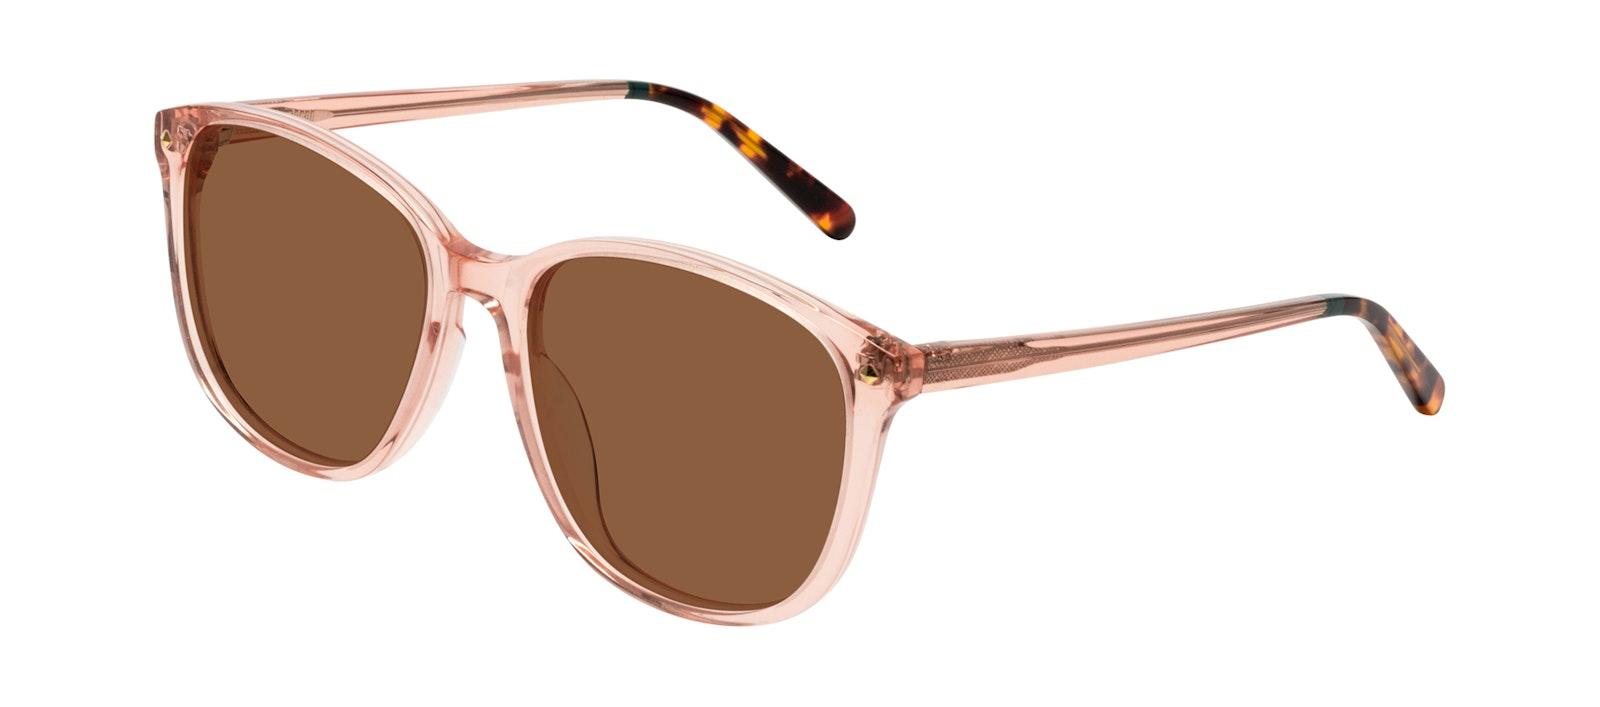 Affordable Fashion Glasses Square Sunglasses Women Lauren Peach Tilt